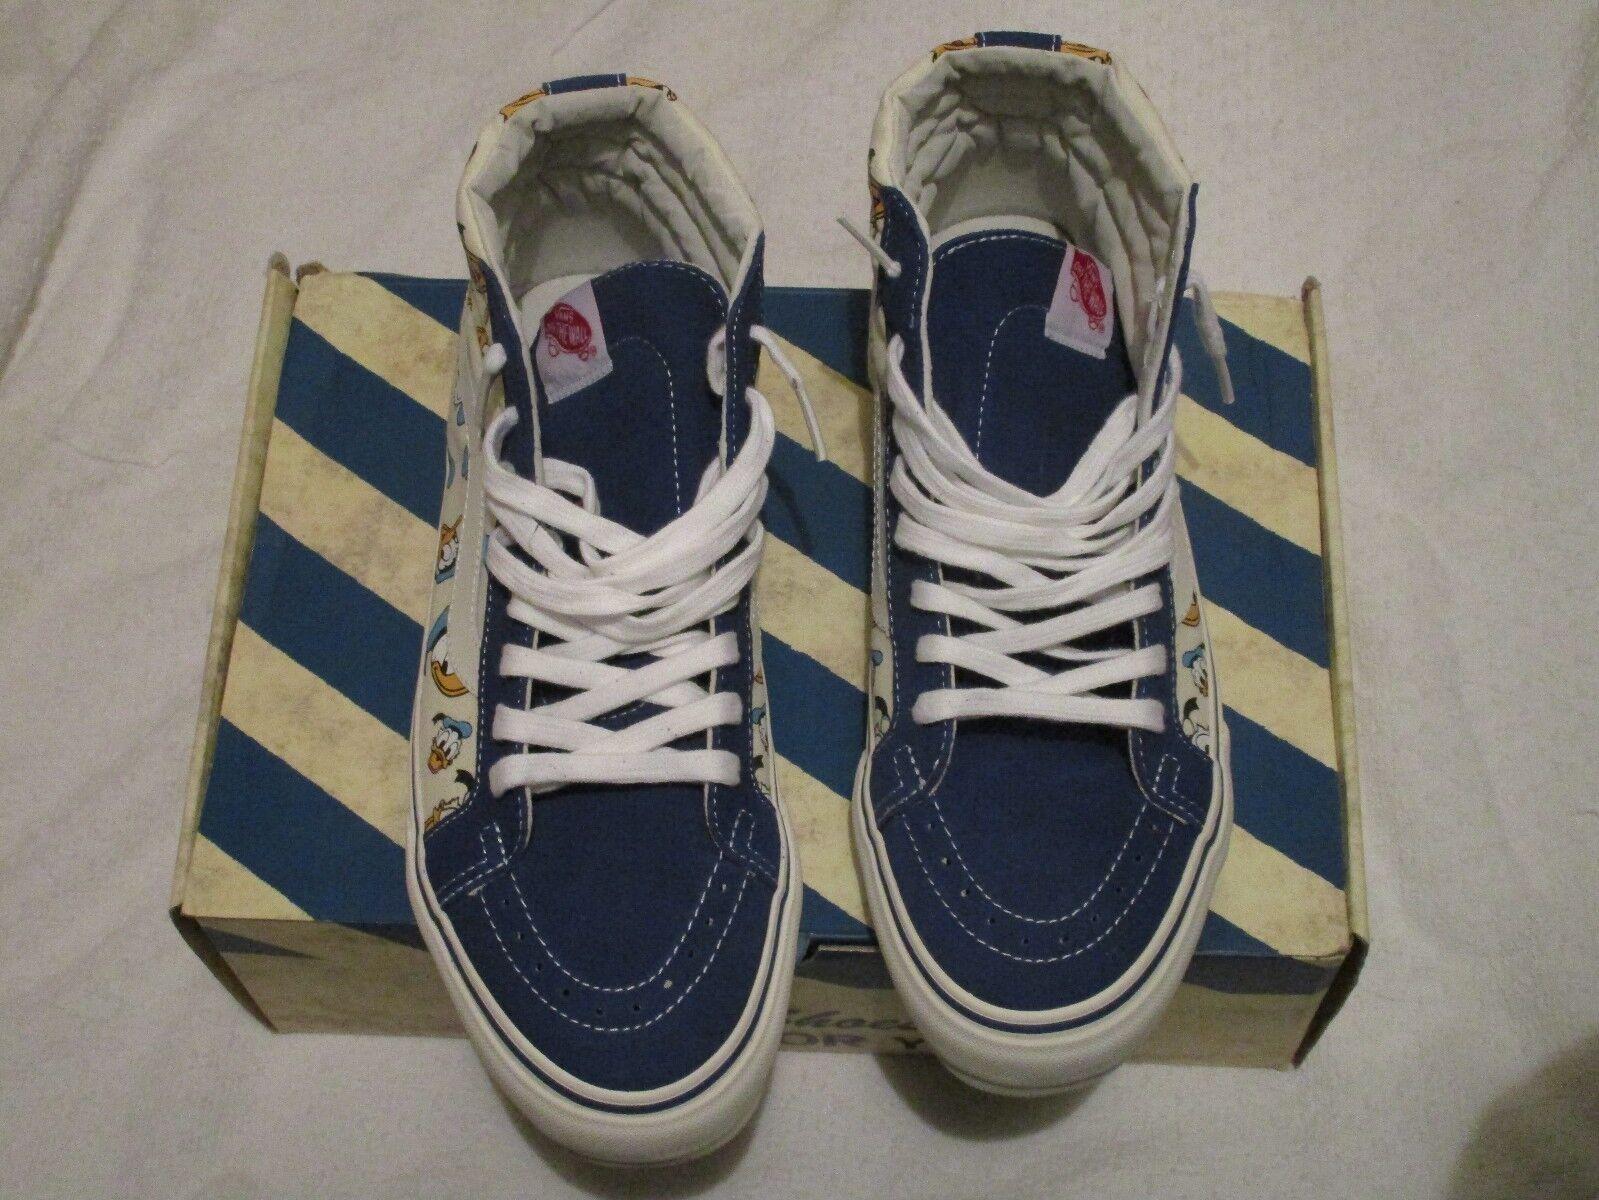 Vans OG Sk8-Hi LX Donald Duck True bluee VN-0OZE8KL Size 10 Sneakers